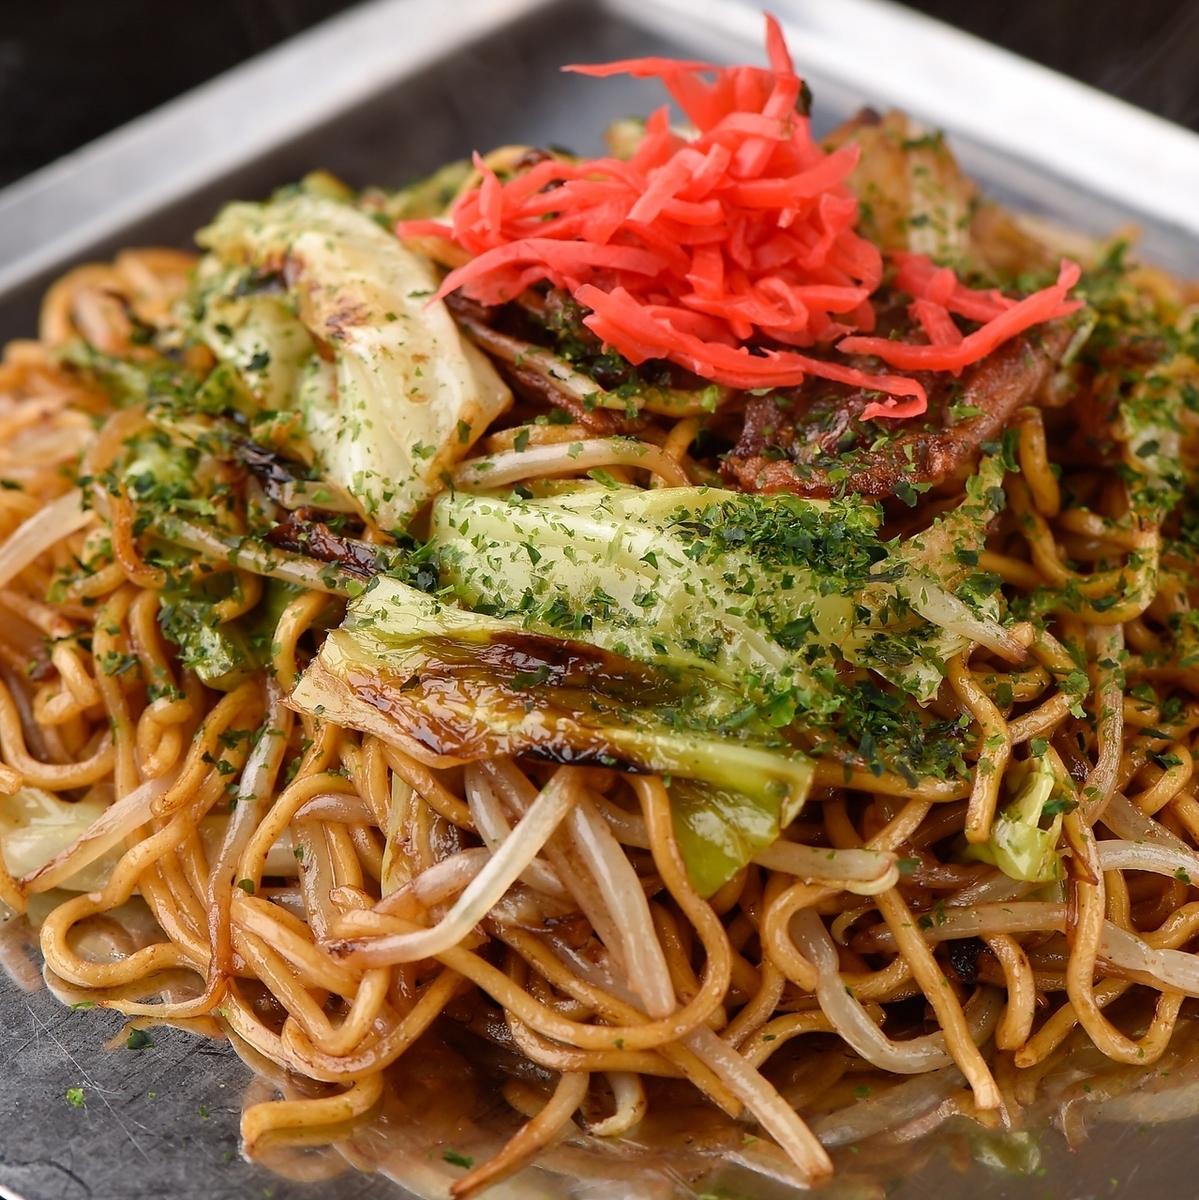 Meat-fried noodles